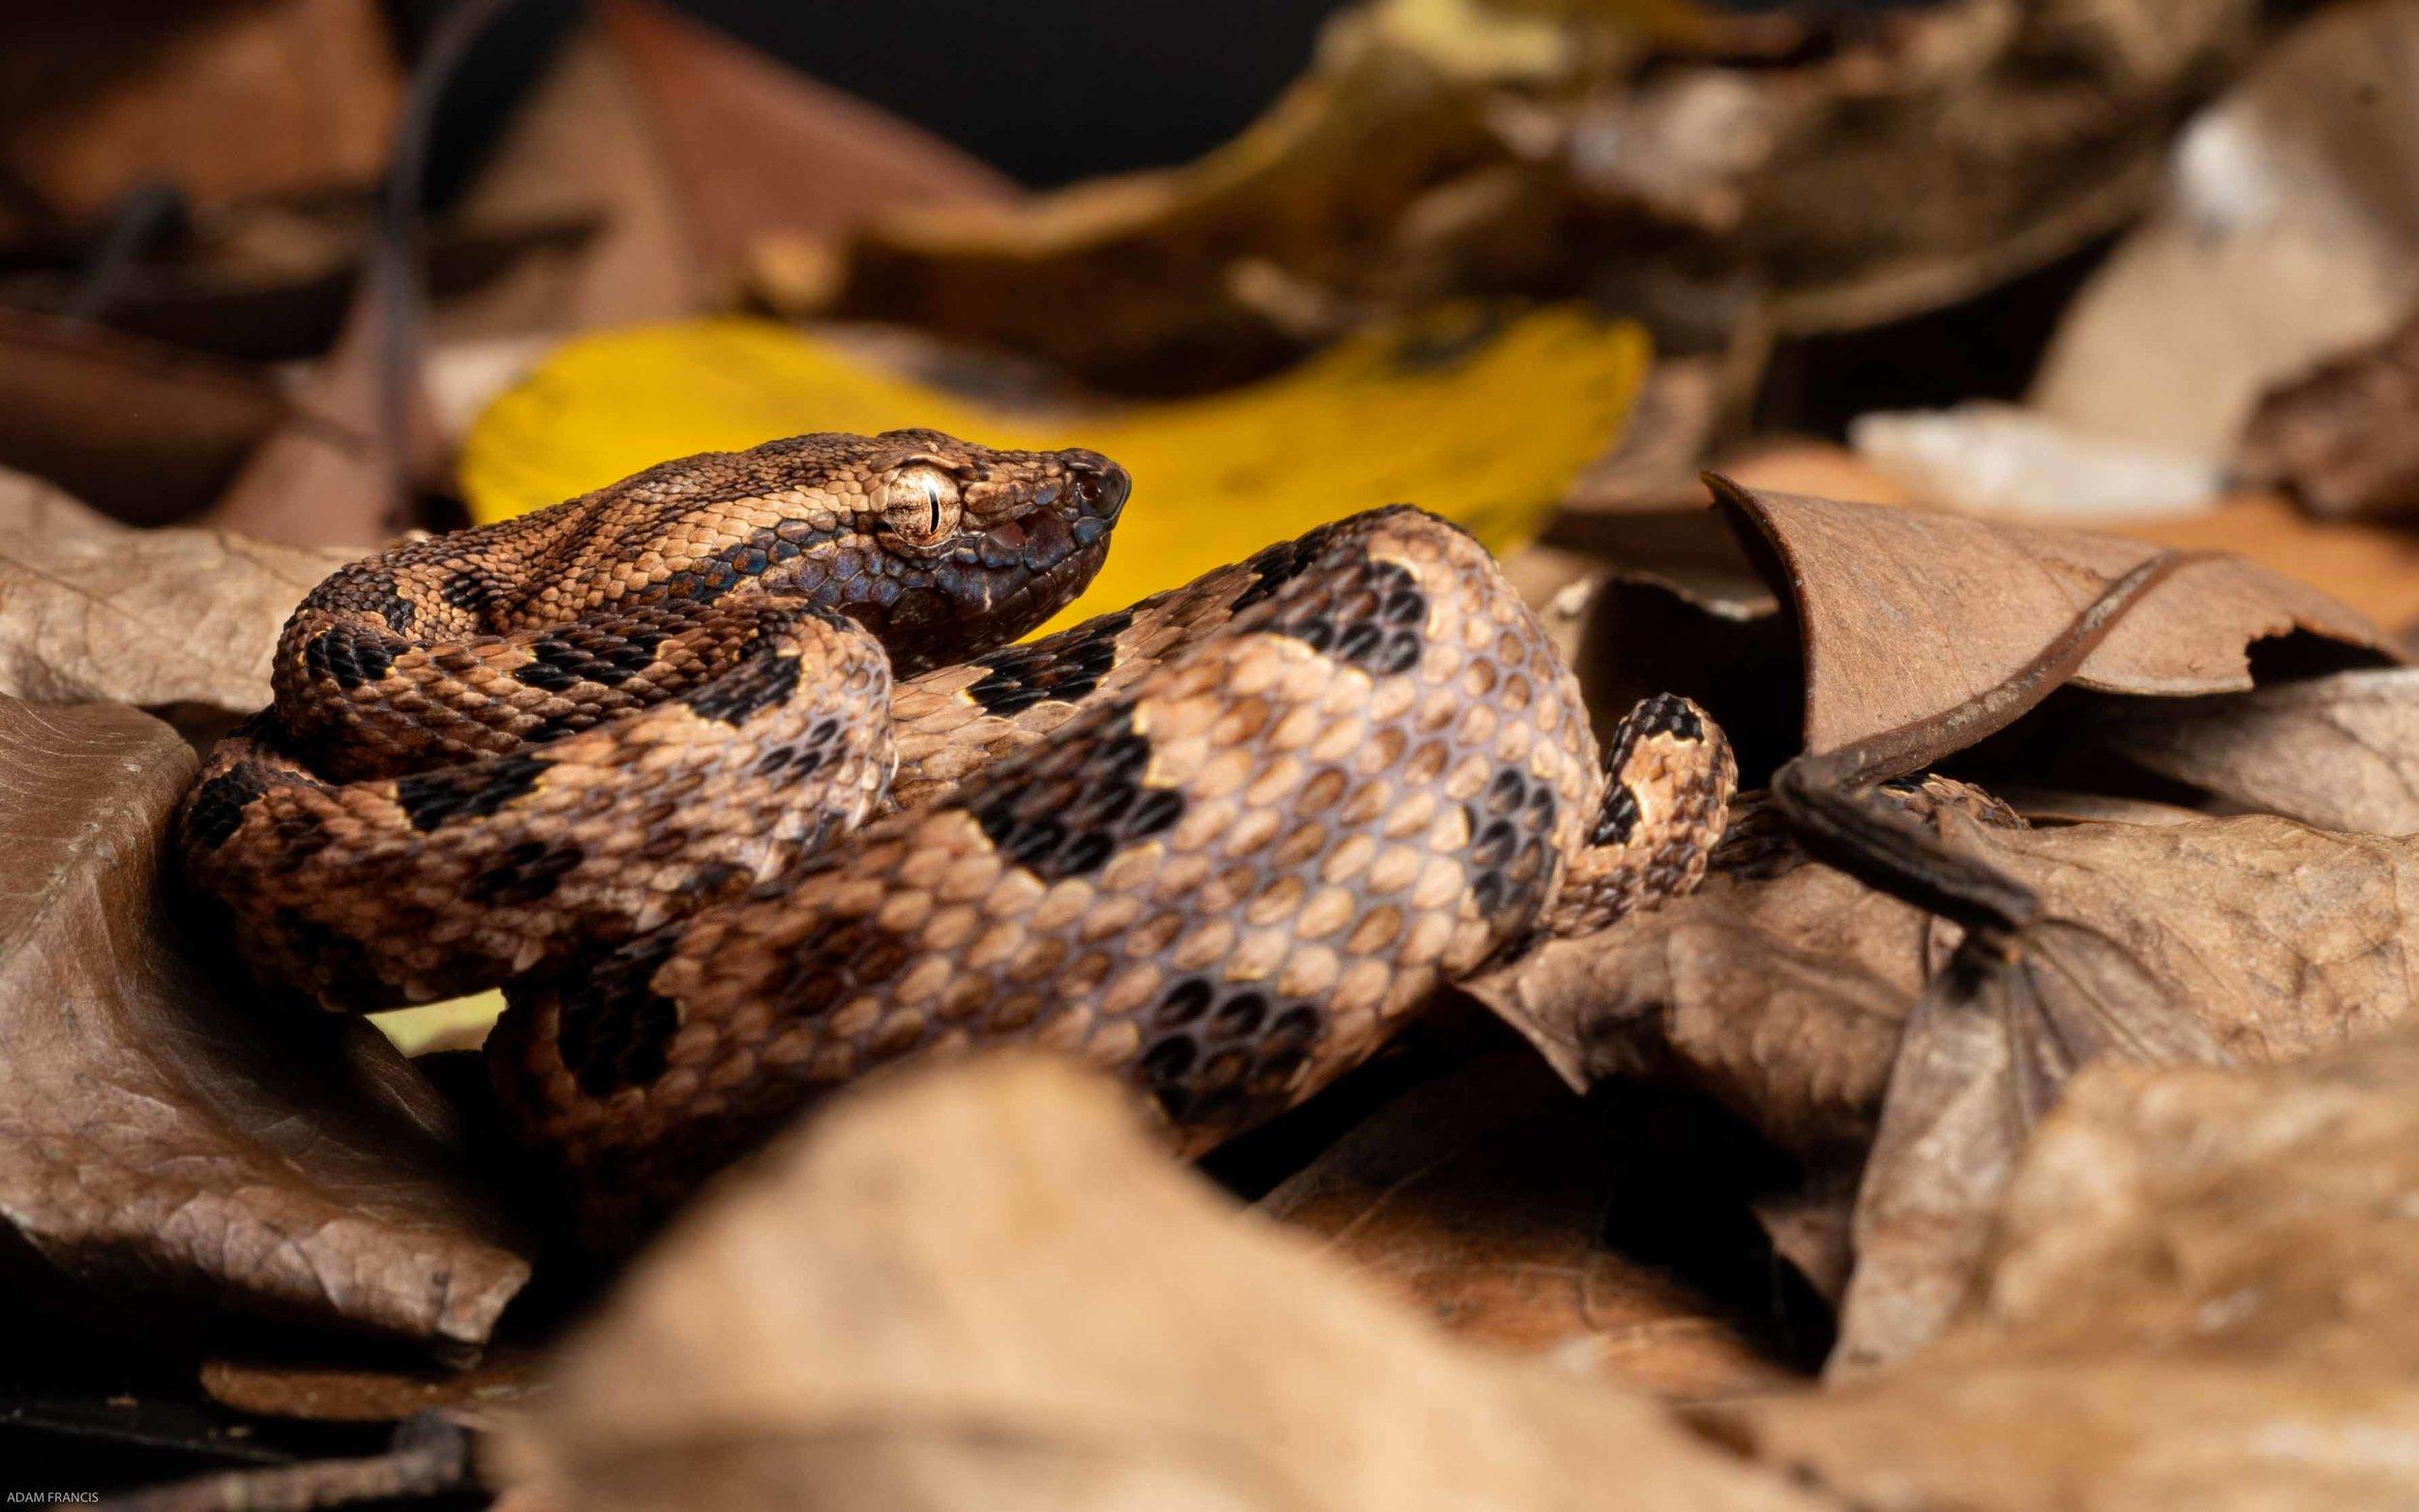 Pointed Scale Viper a.k.a. Habu - Protobothrops mucrosquamatus